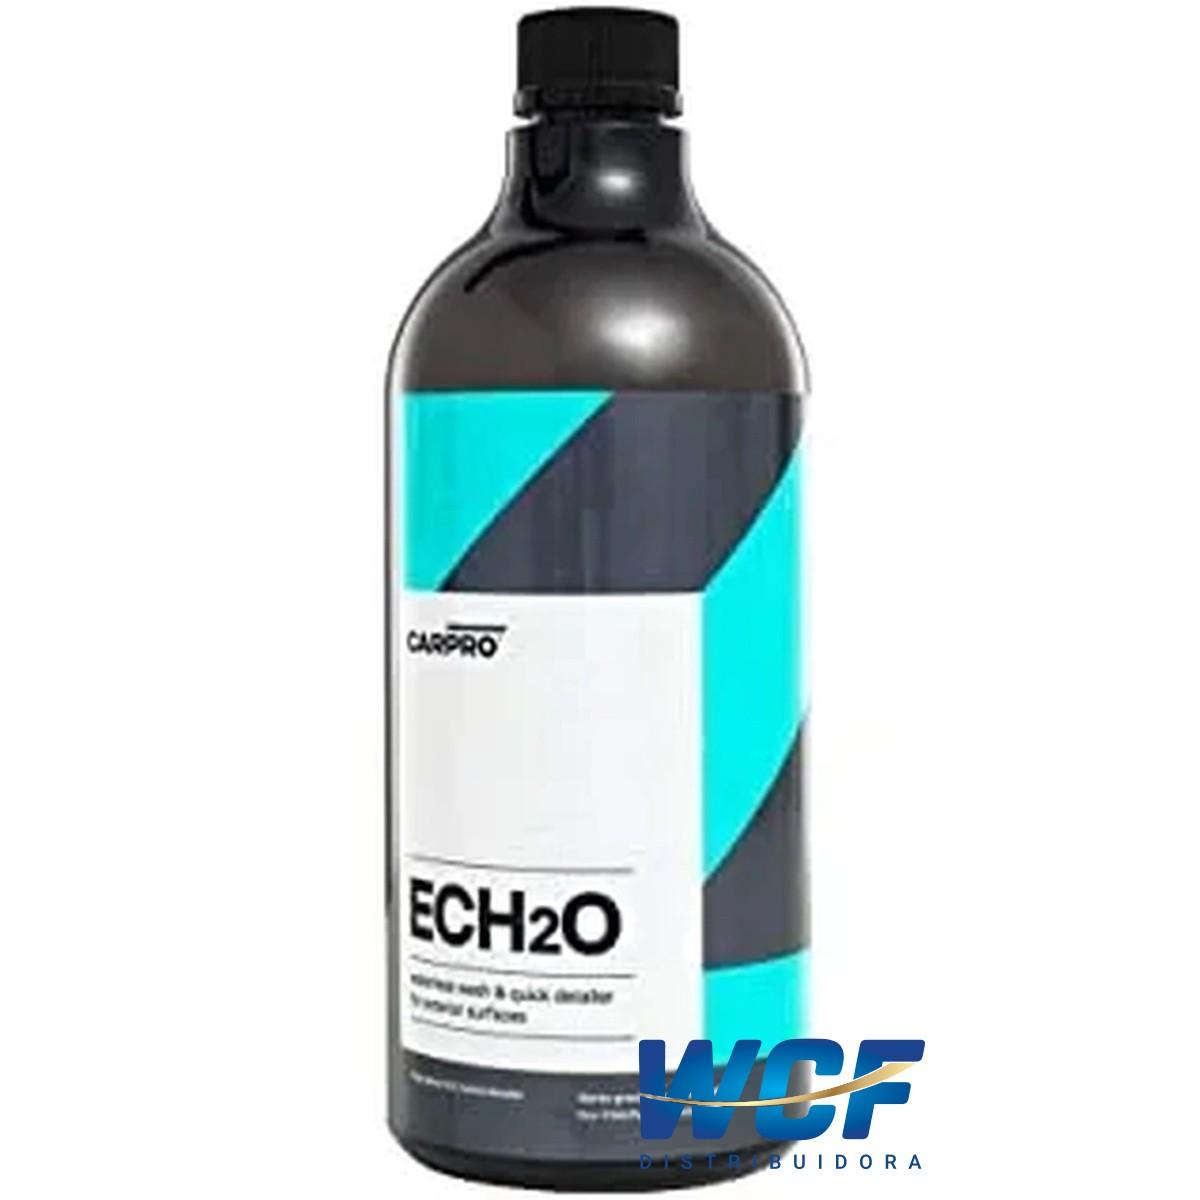 CARPRO ECH2O 1L LIMPEZA A SECO